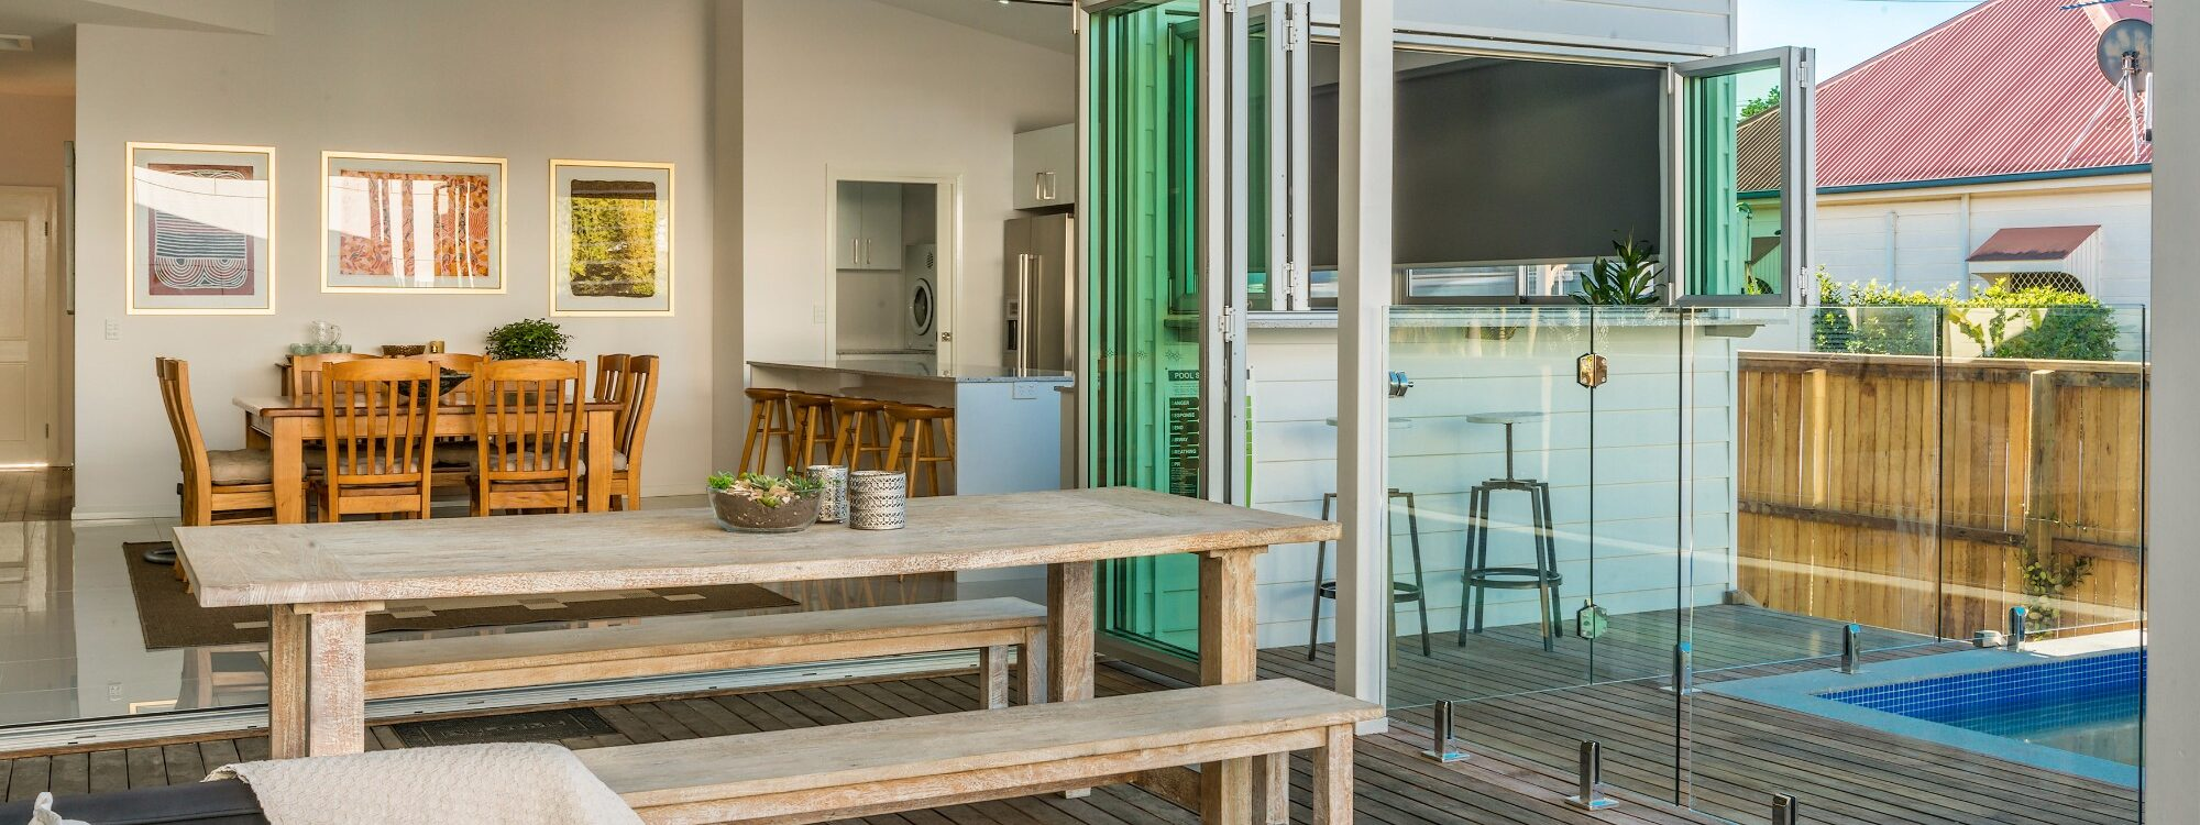 Aditi - Outdoor table